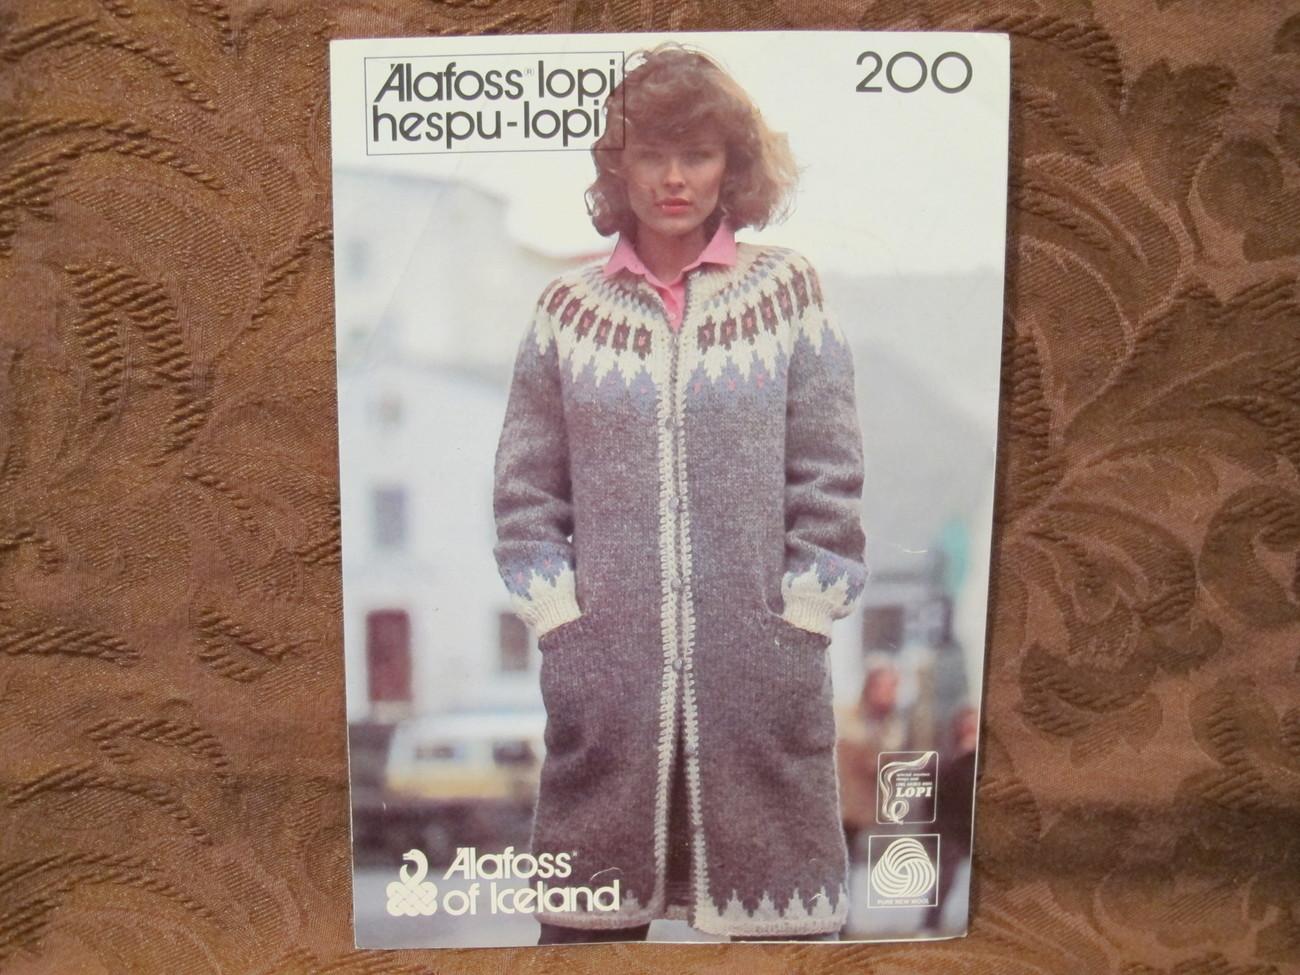 Alafoss Lopi ICELAND Knitting Patterns and similar items